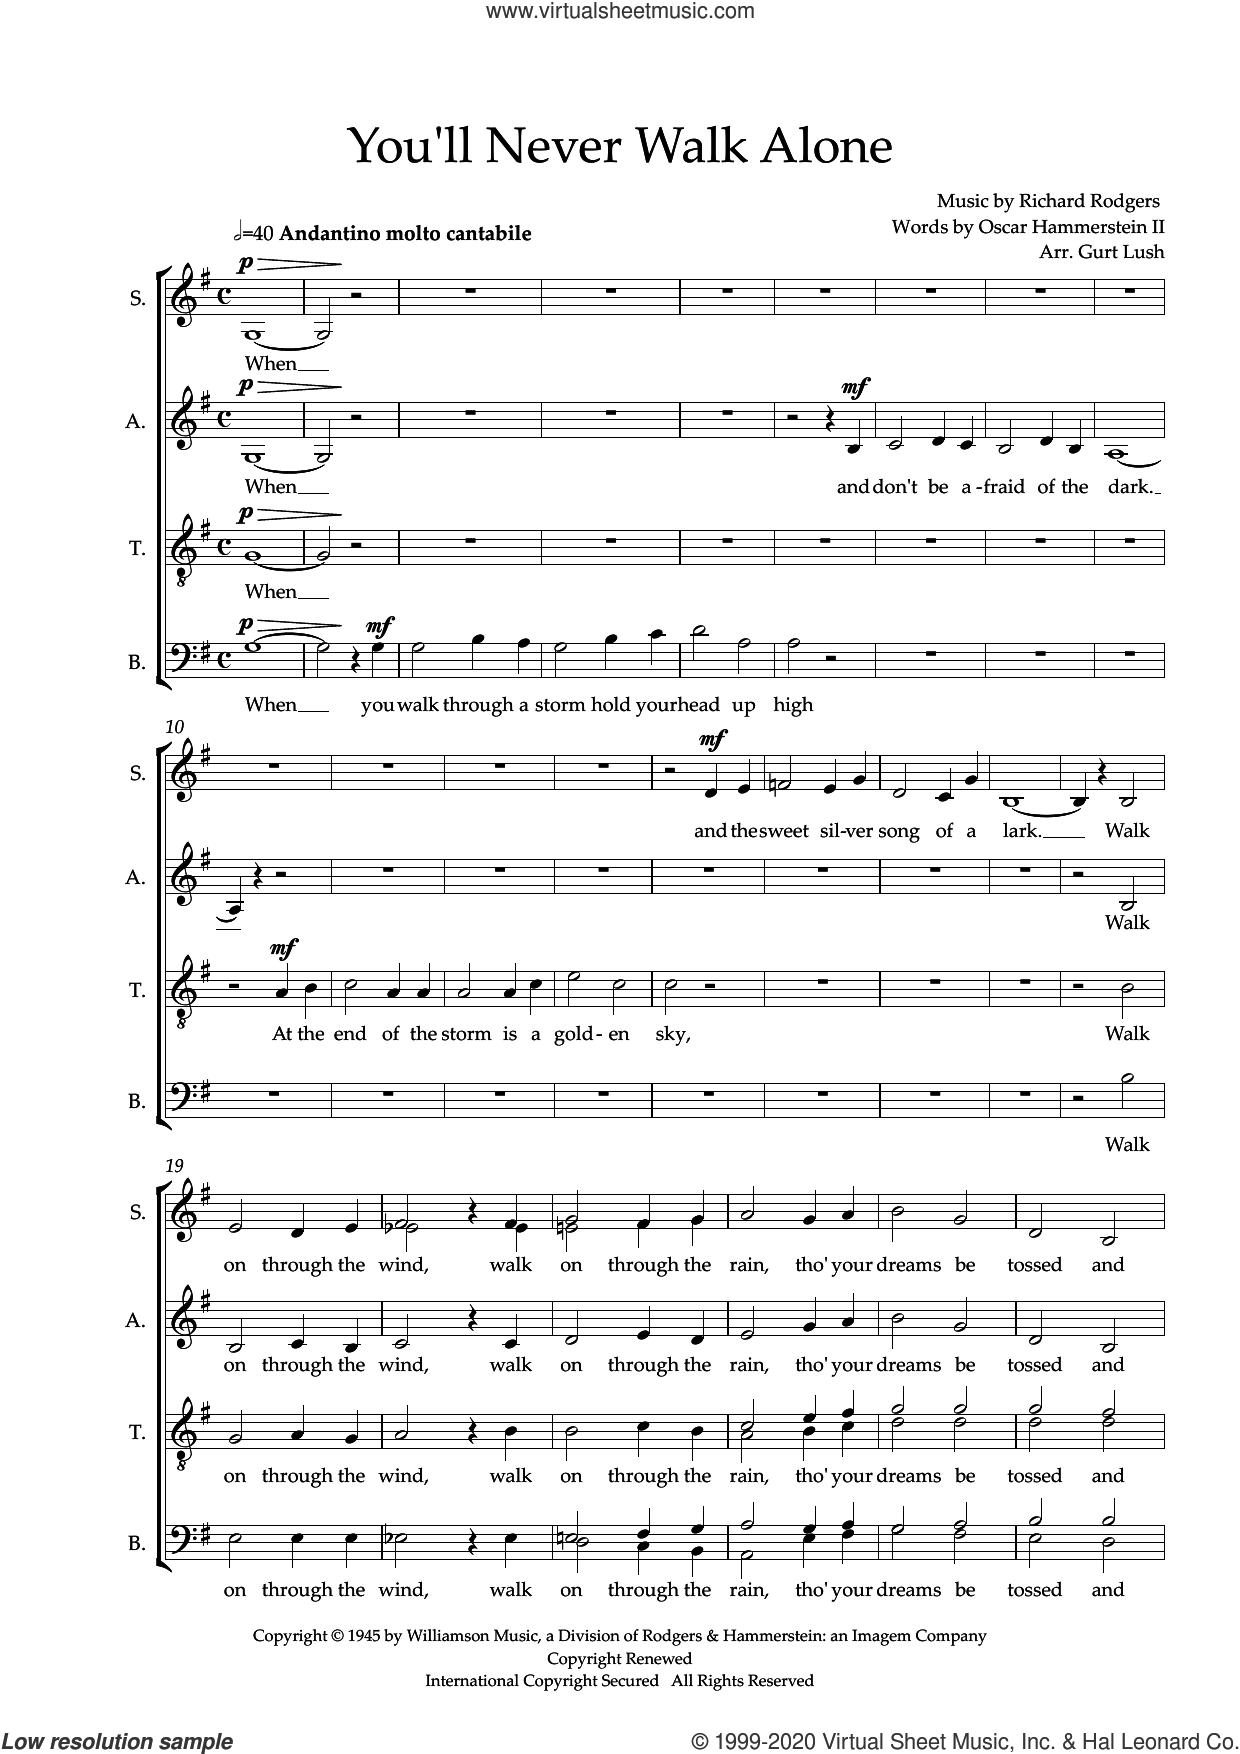 You'll Never Walk Alone (arr. Sam Burns) sheet music for choir (SATB: soprano, alto, tenor, bass) by Richard Rodgers, Sam Burns, Oscar II Hammerstein and Rodgers & Hammerstein, intermediate skill level